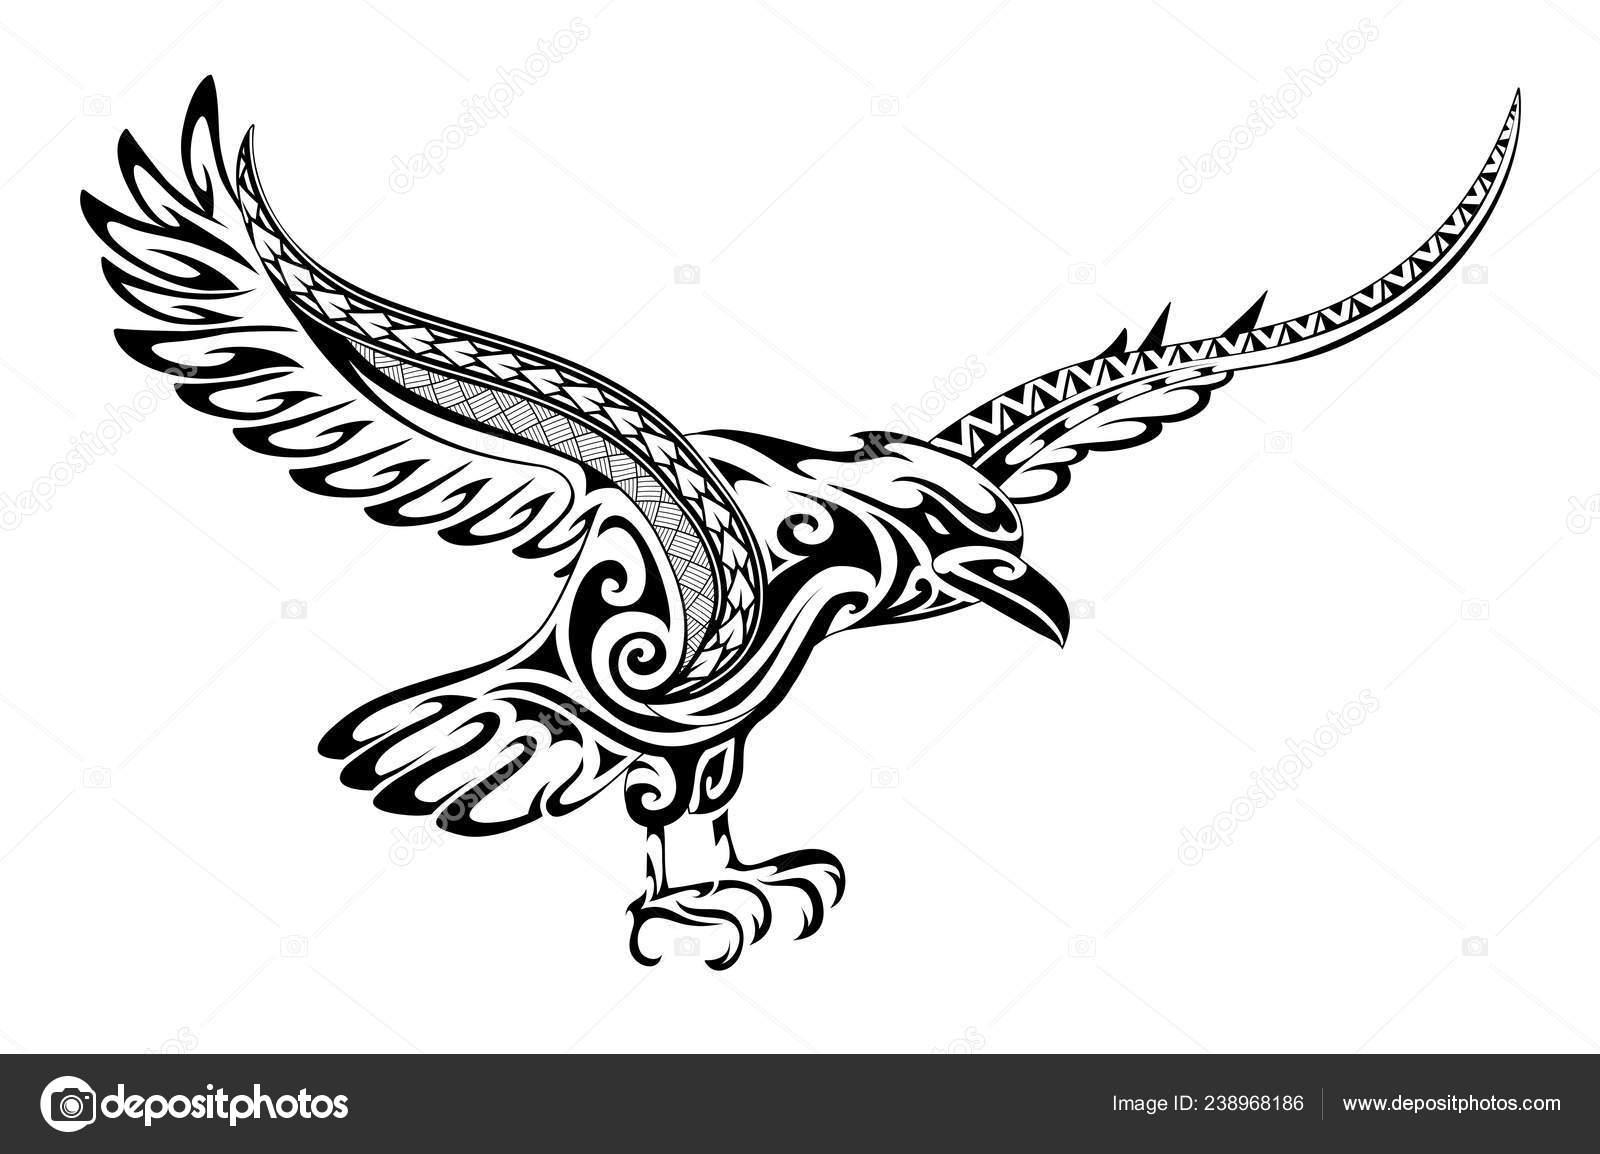 Plemienny Tatuaż Kruk Kształt Grafika Wektorowa Akvlv